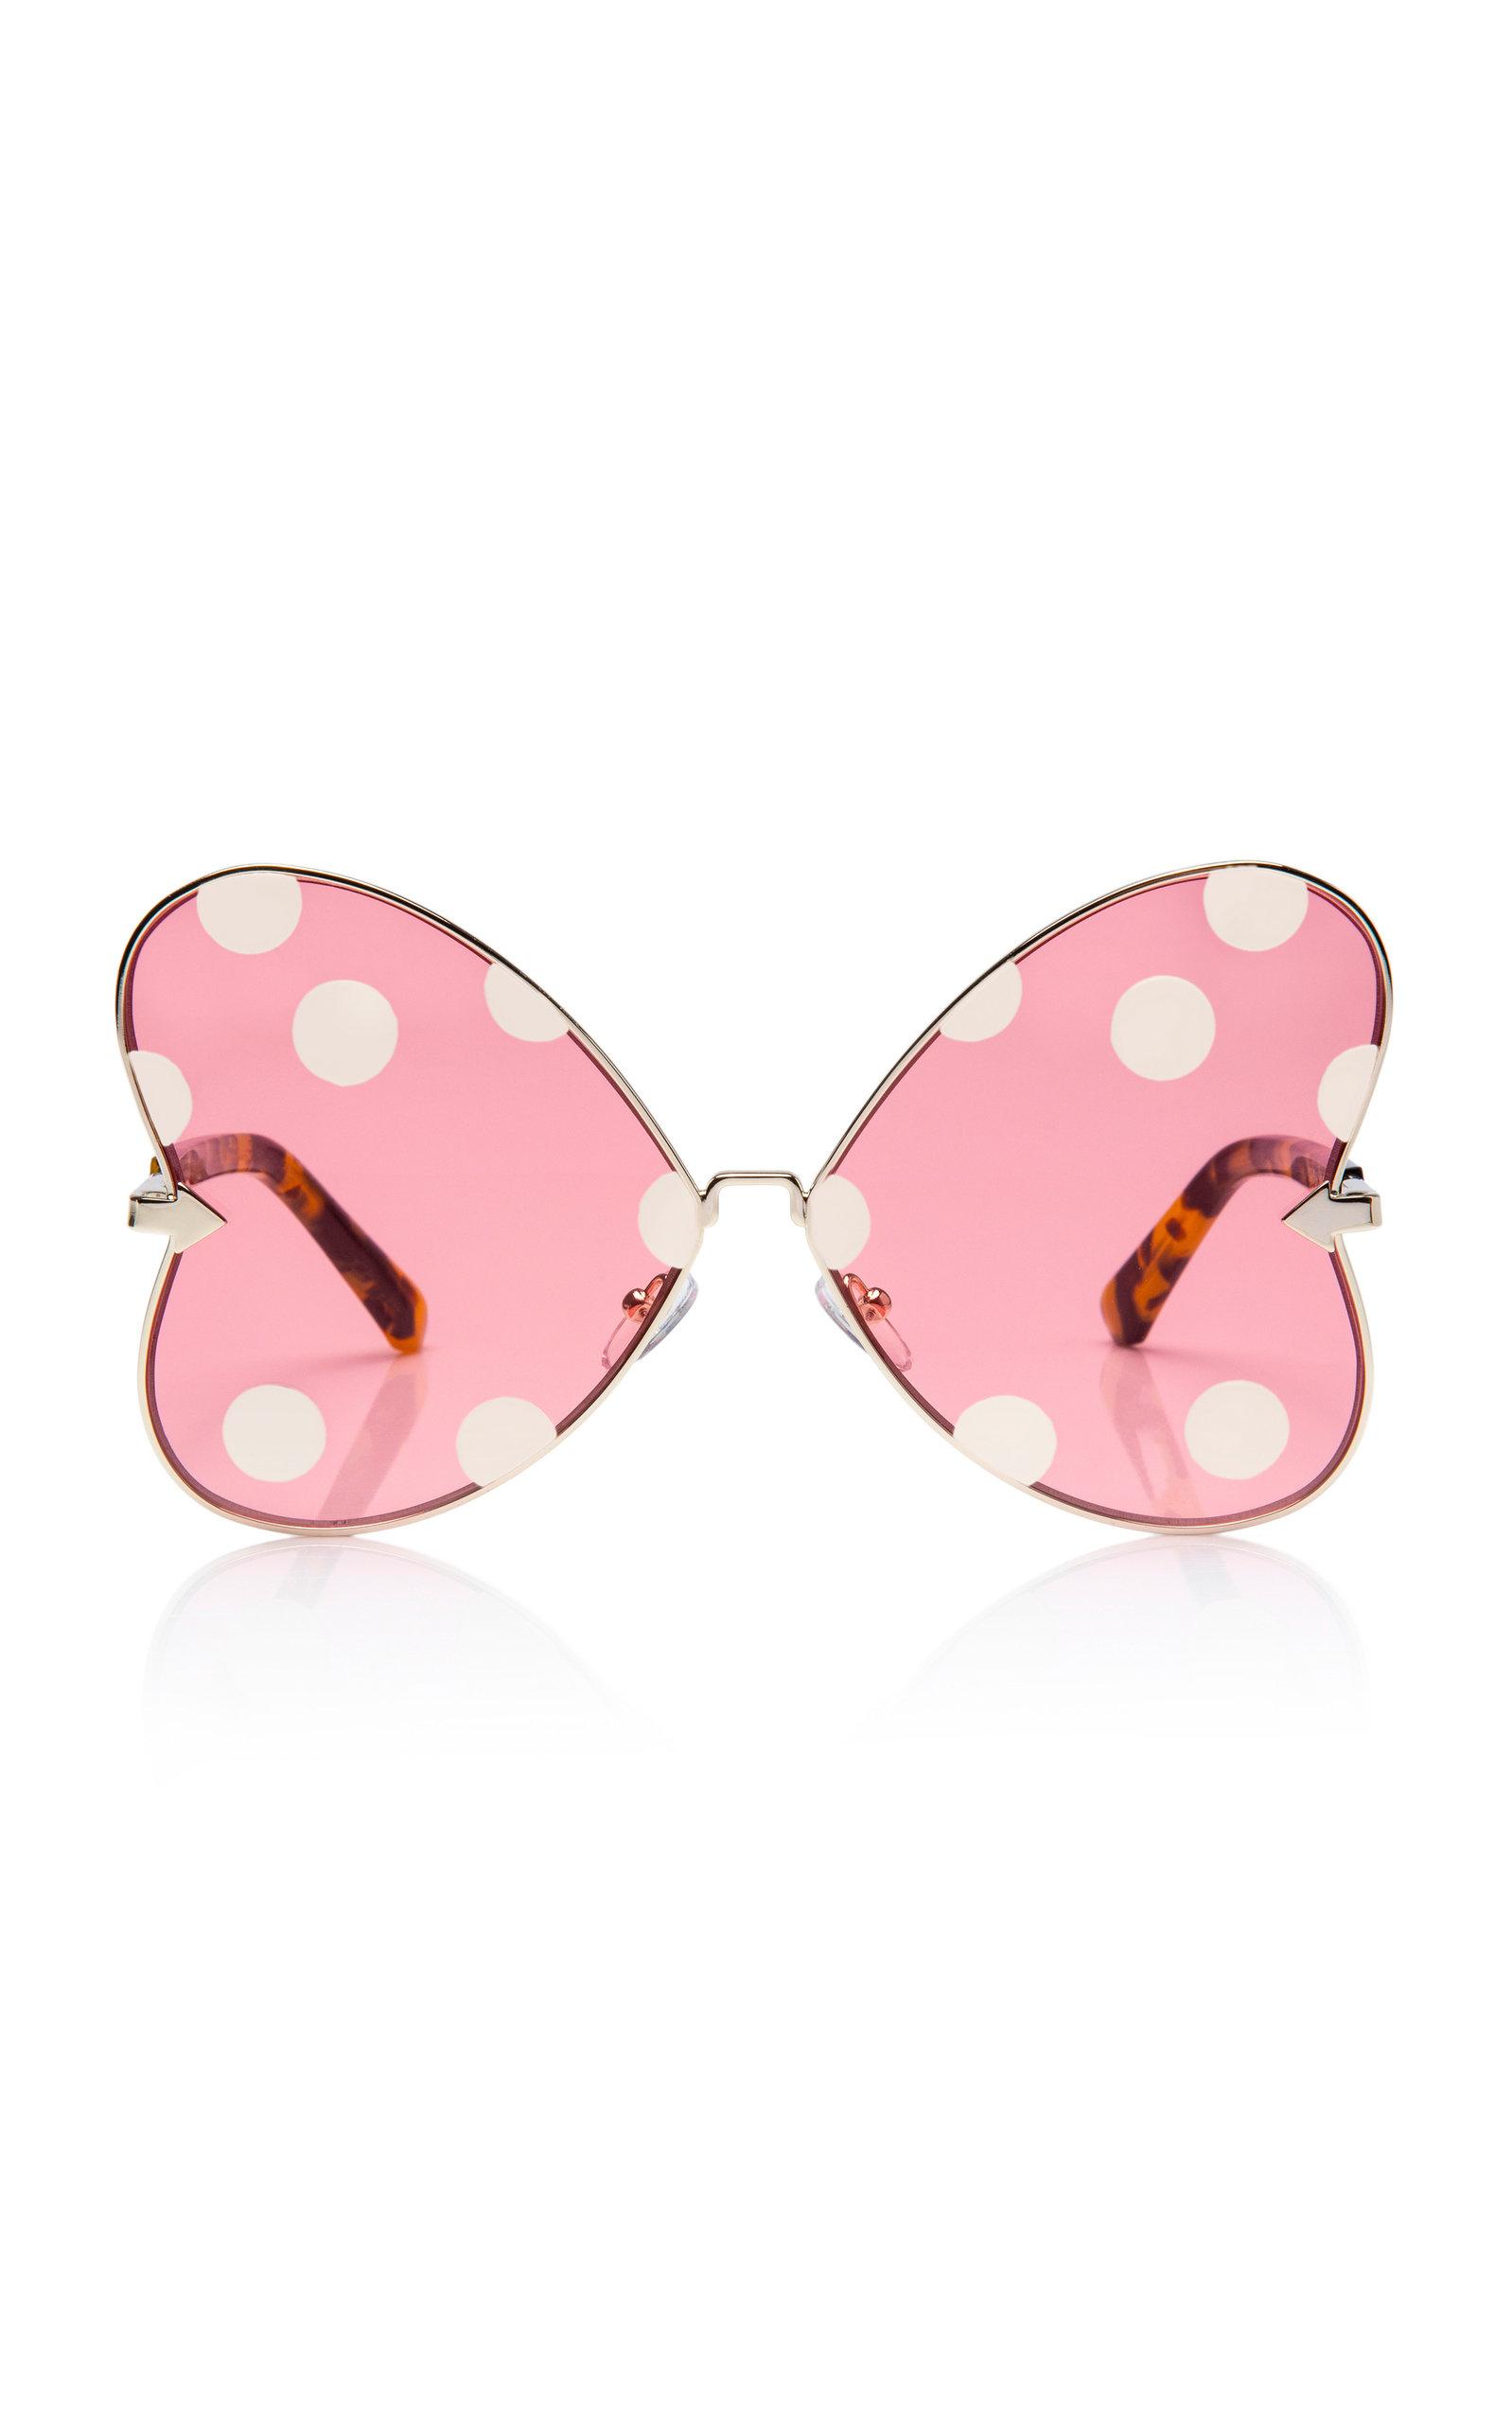 c666cb8aa7fc Minnie Bow Oversized Sunglasses by Karen Walker X Disney | Moda Operandi